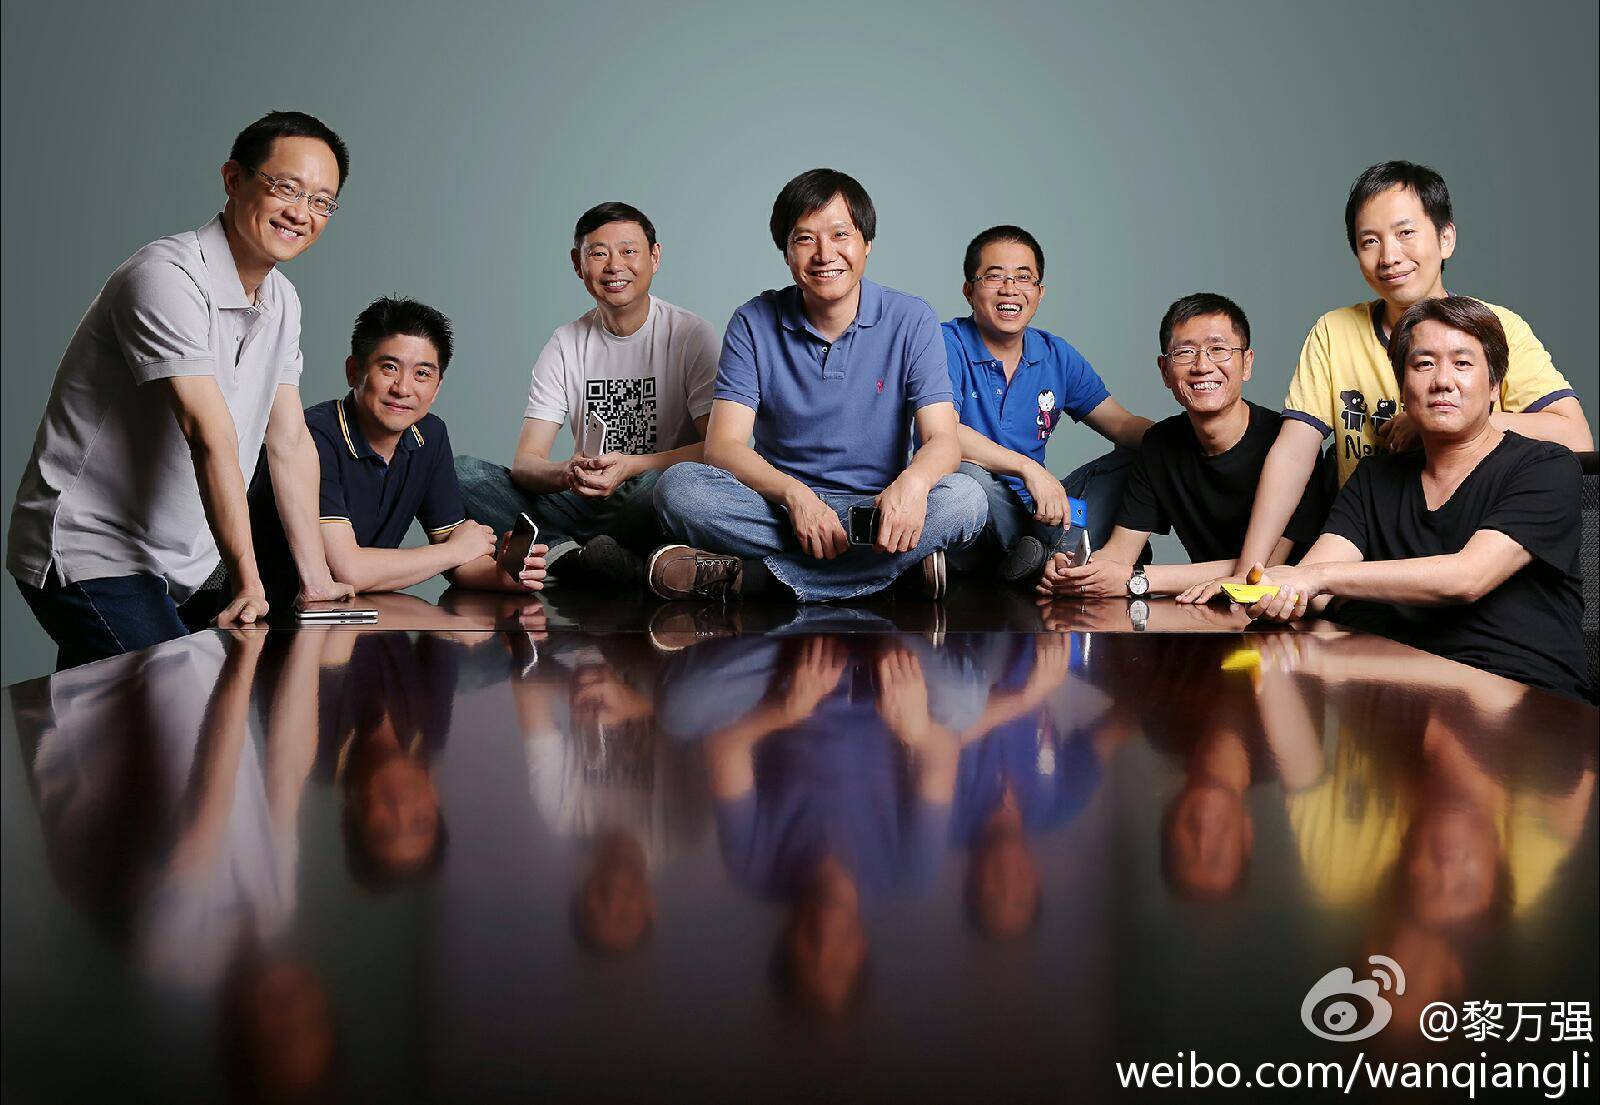 xiaomi founder 2